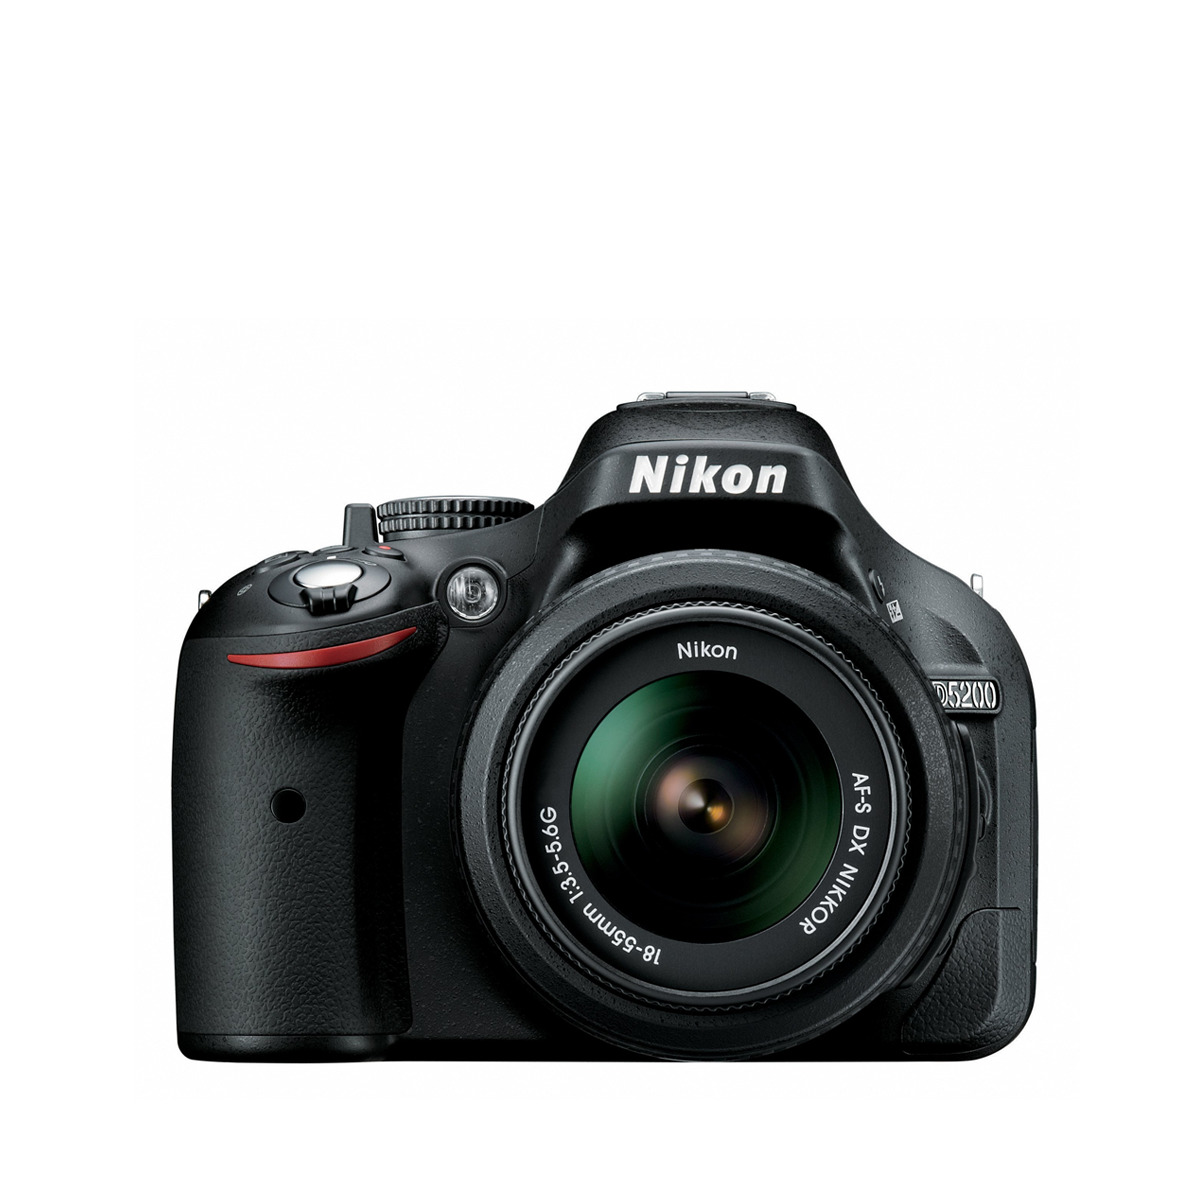 Cámara réflex digital Nikon D5200 con Objetivo AF-S DX 18-55mm